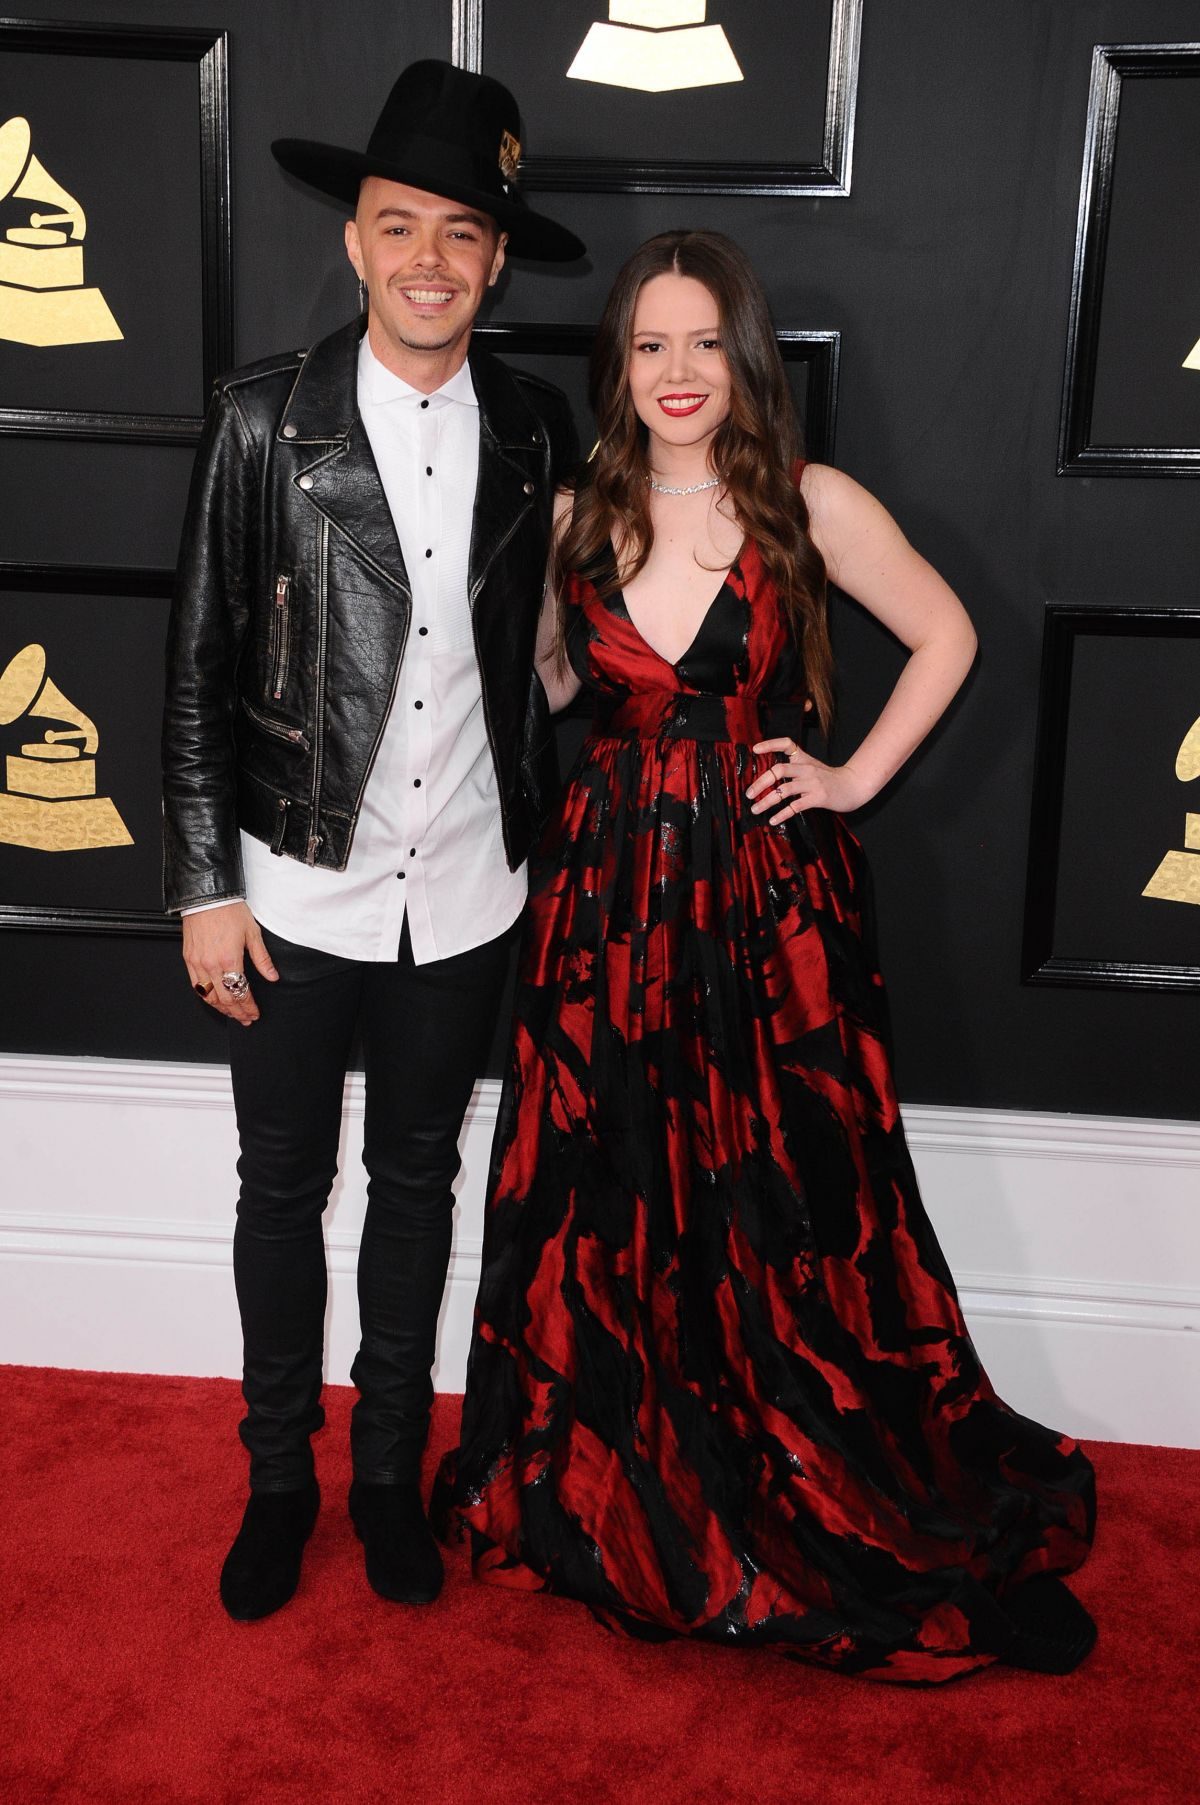 JOY HUERTA at 59th Annual Grammy Awards in Los Angeles 02/12/2017